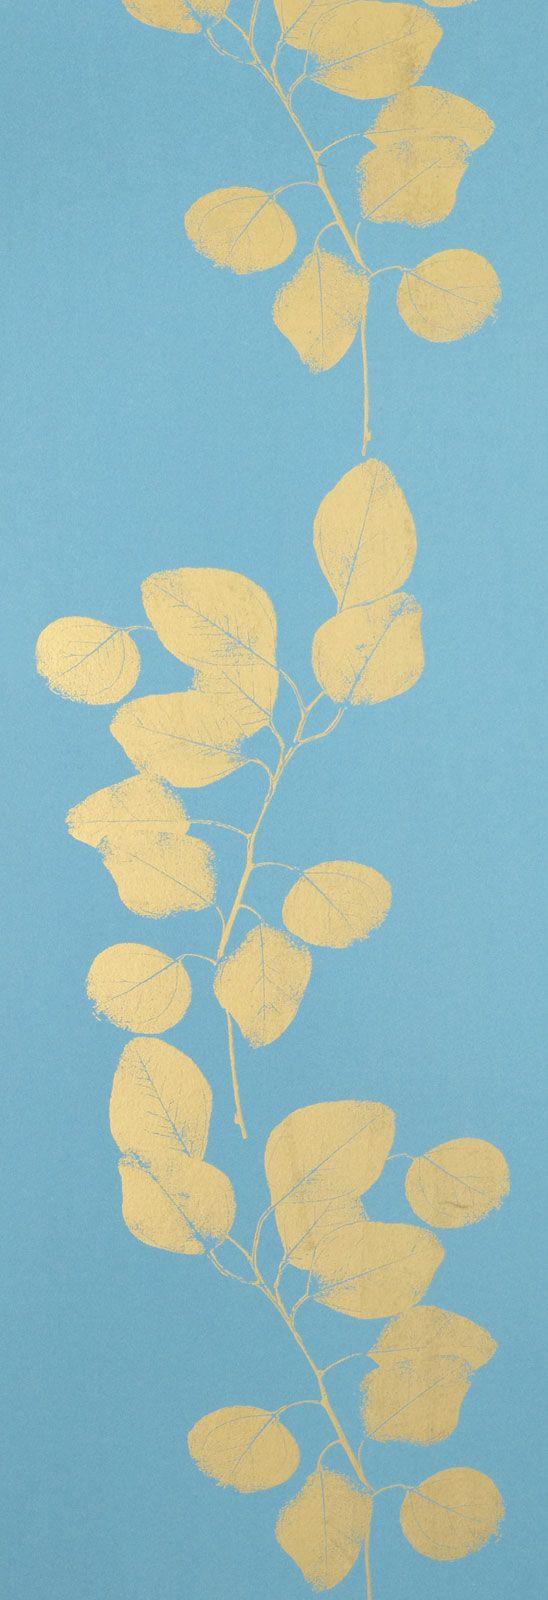 wallpaper | Graphic Design: Patterns & Textures | Pinterest | Wall ...